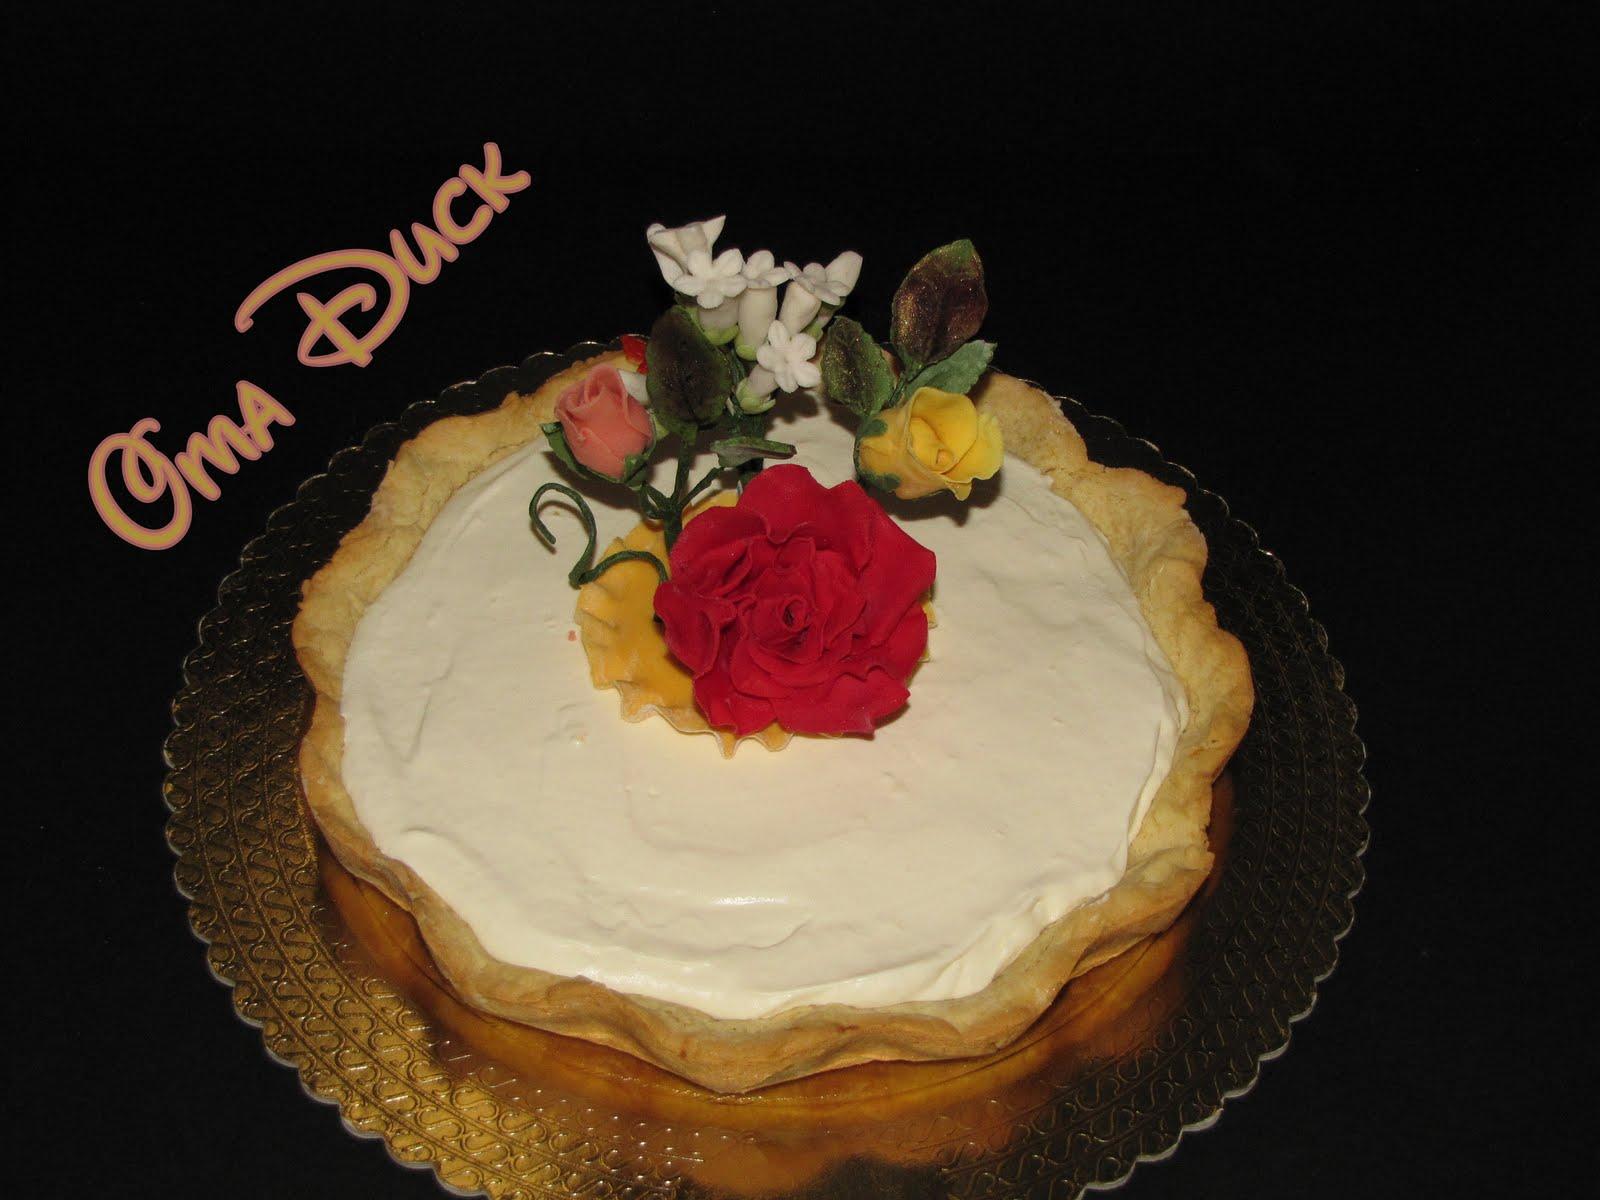 Artistic Cakes And Cookies Wichita Ks